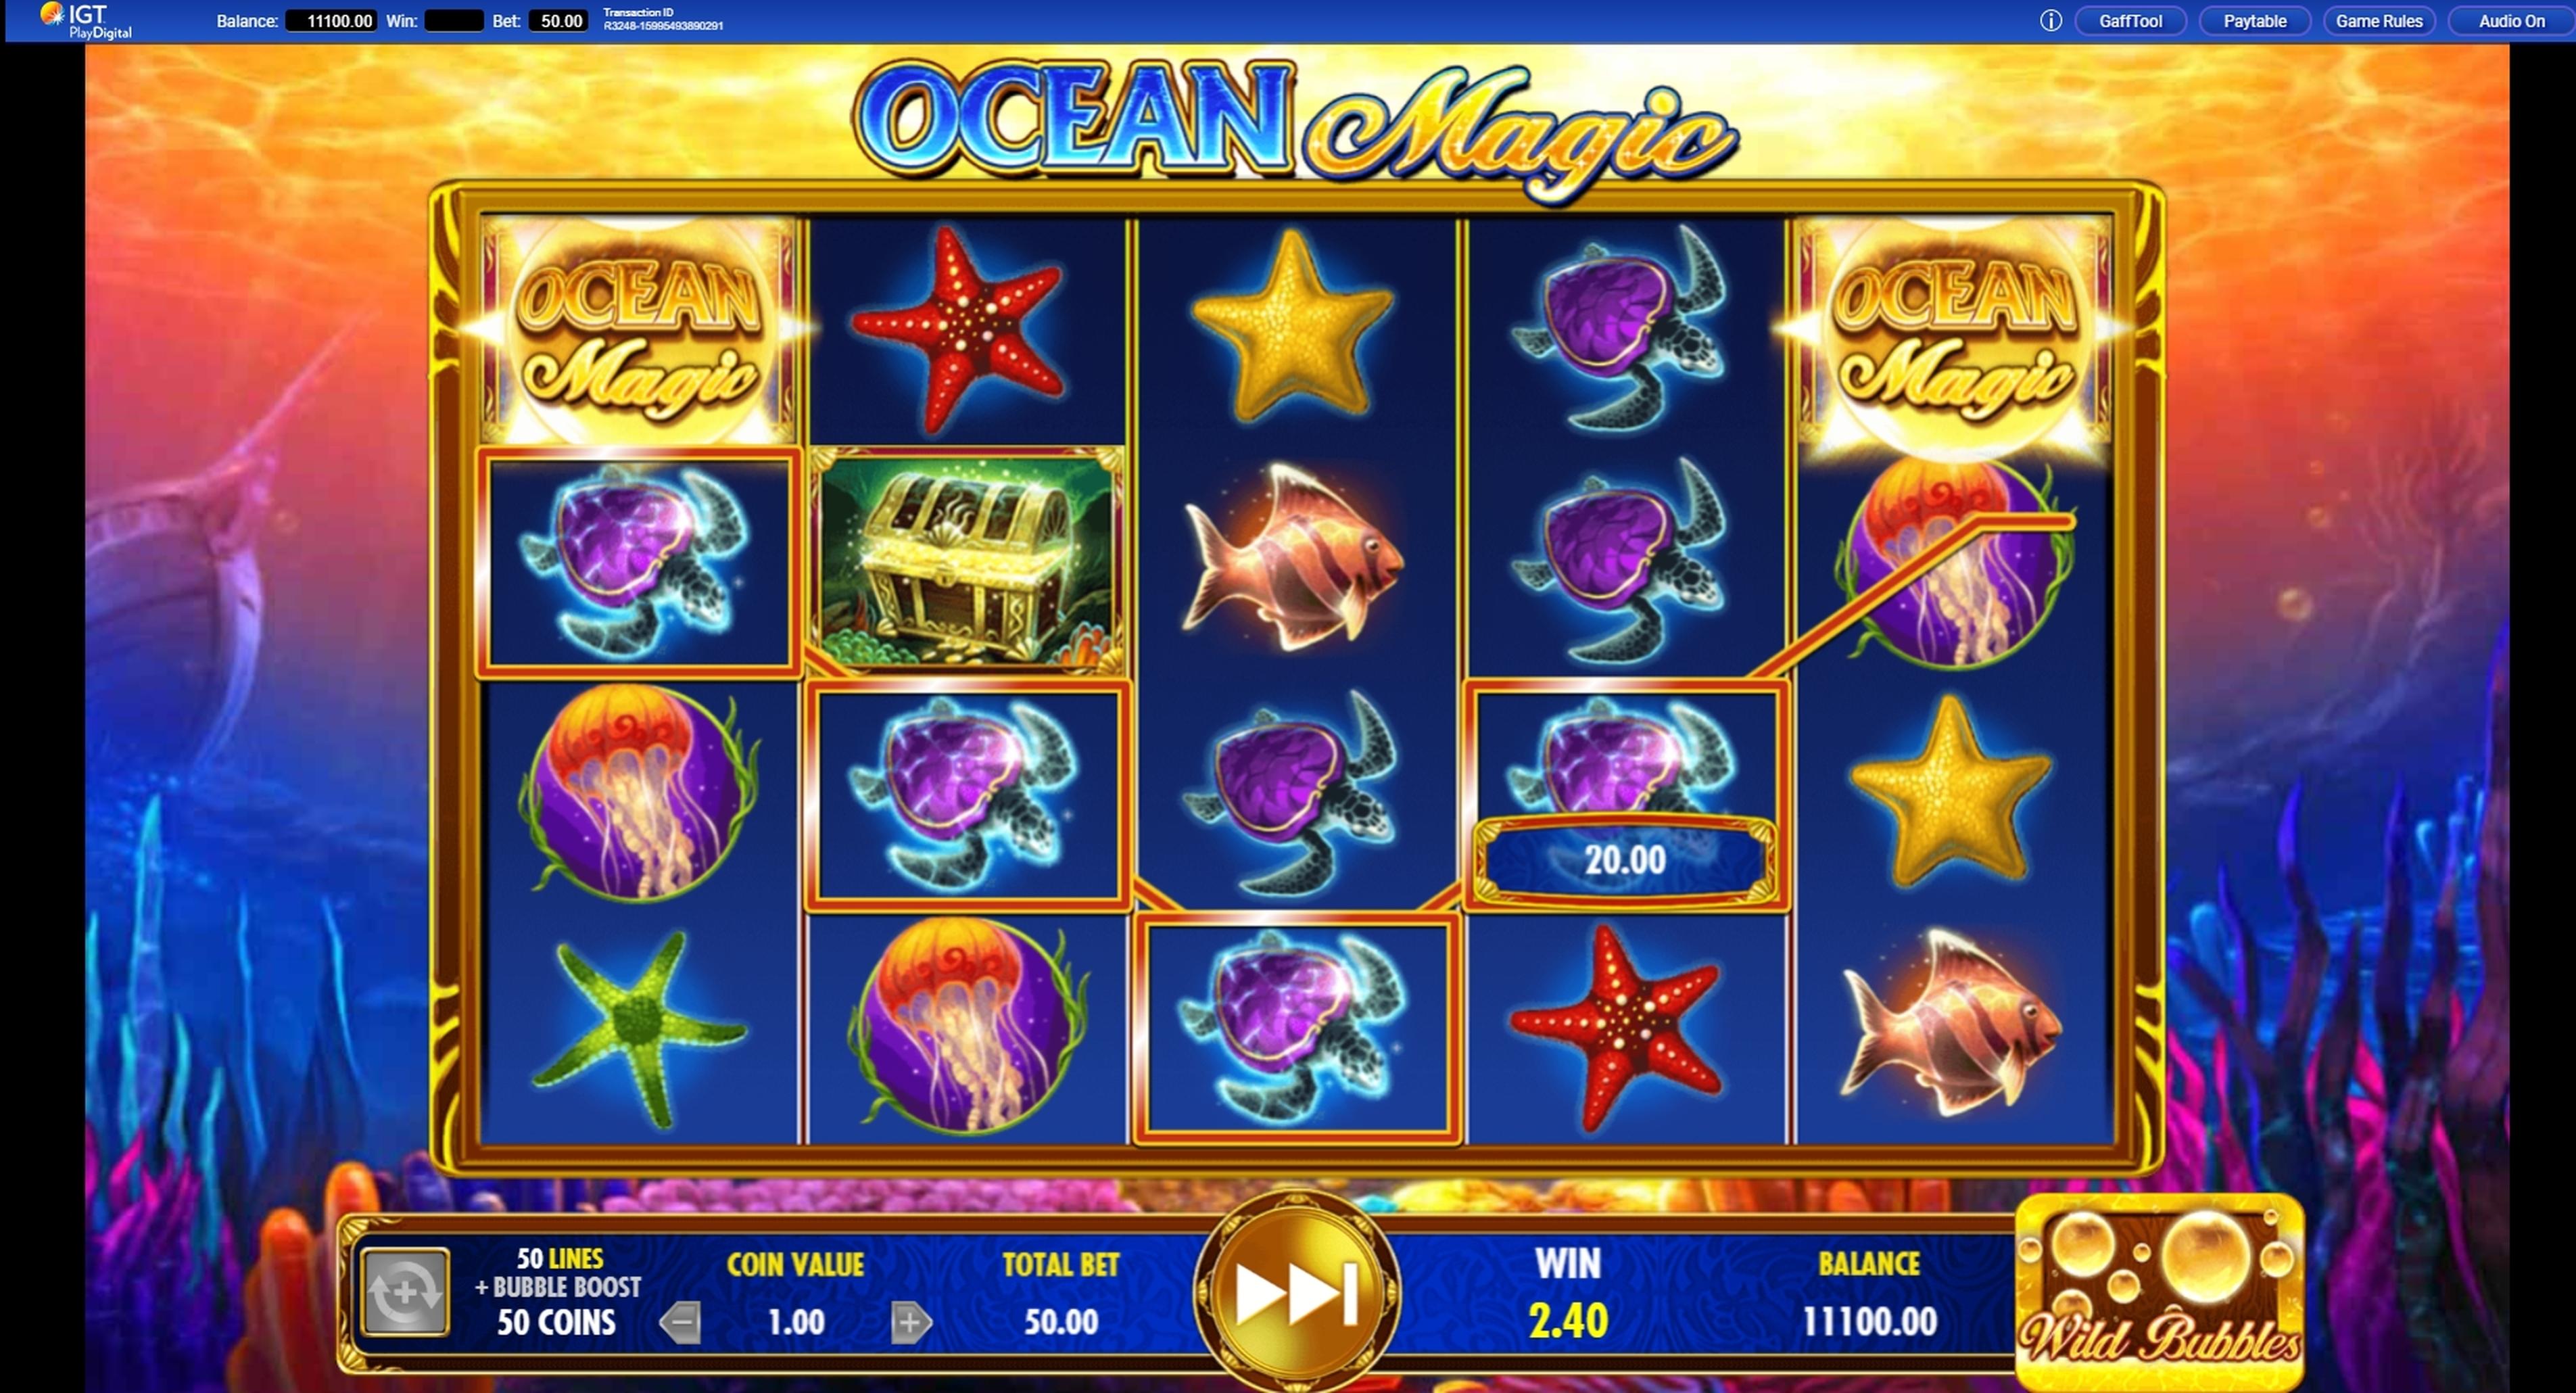 Mohegan sun online casino